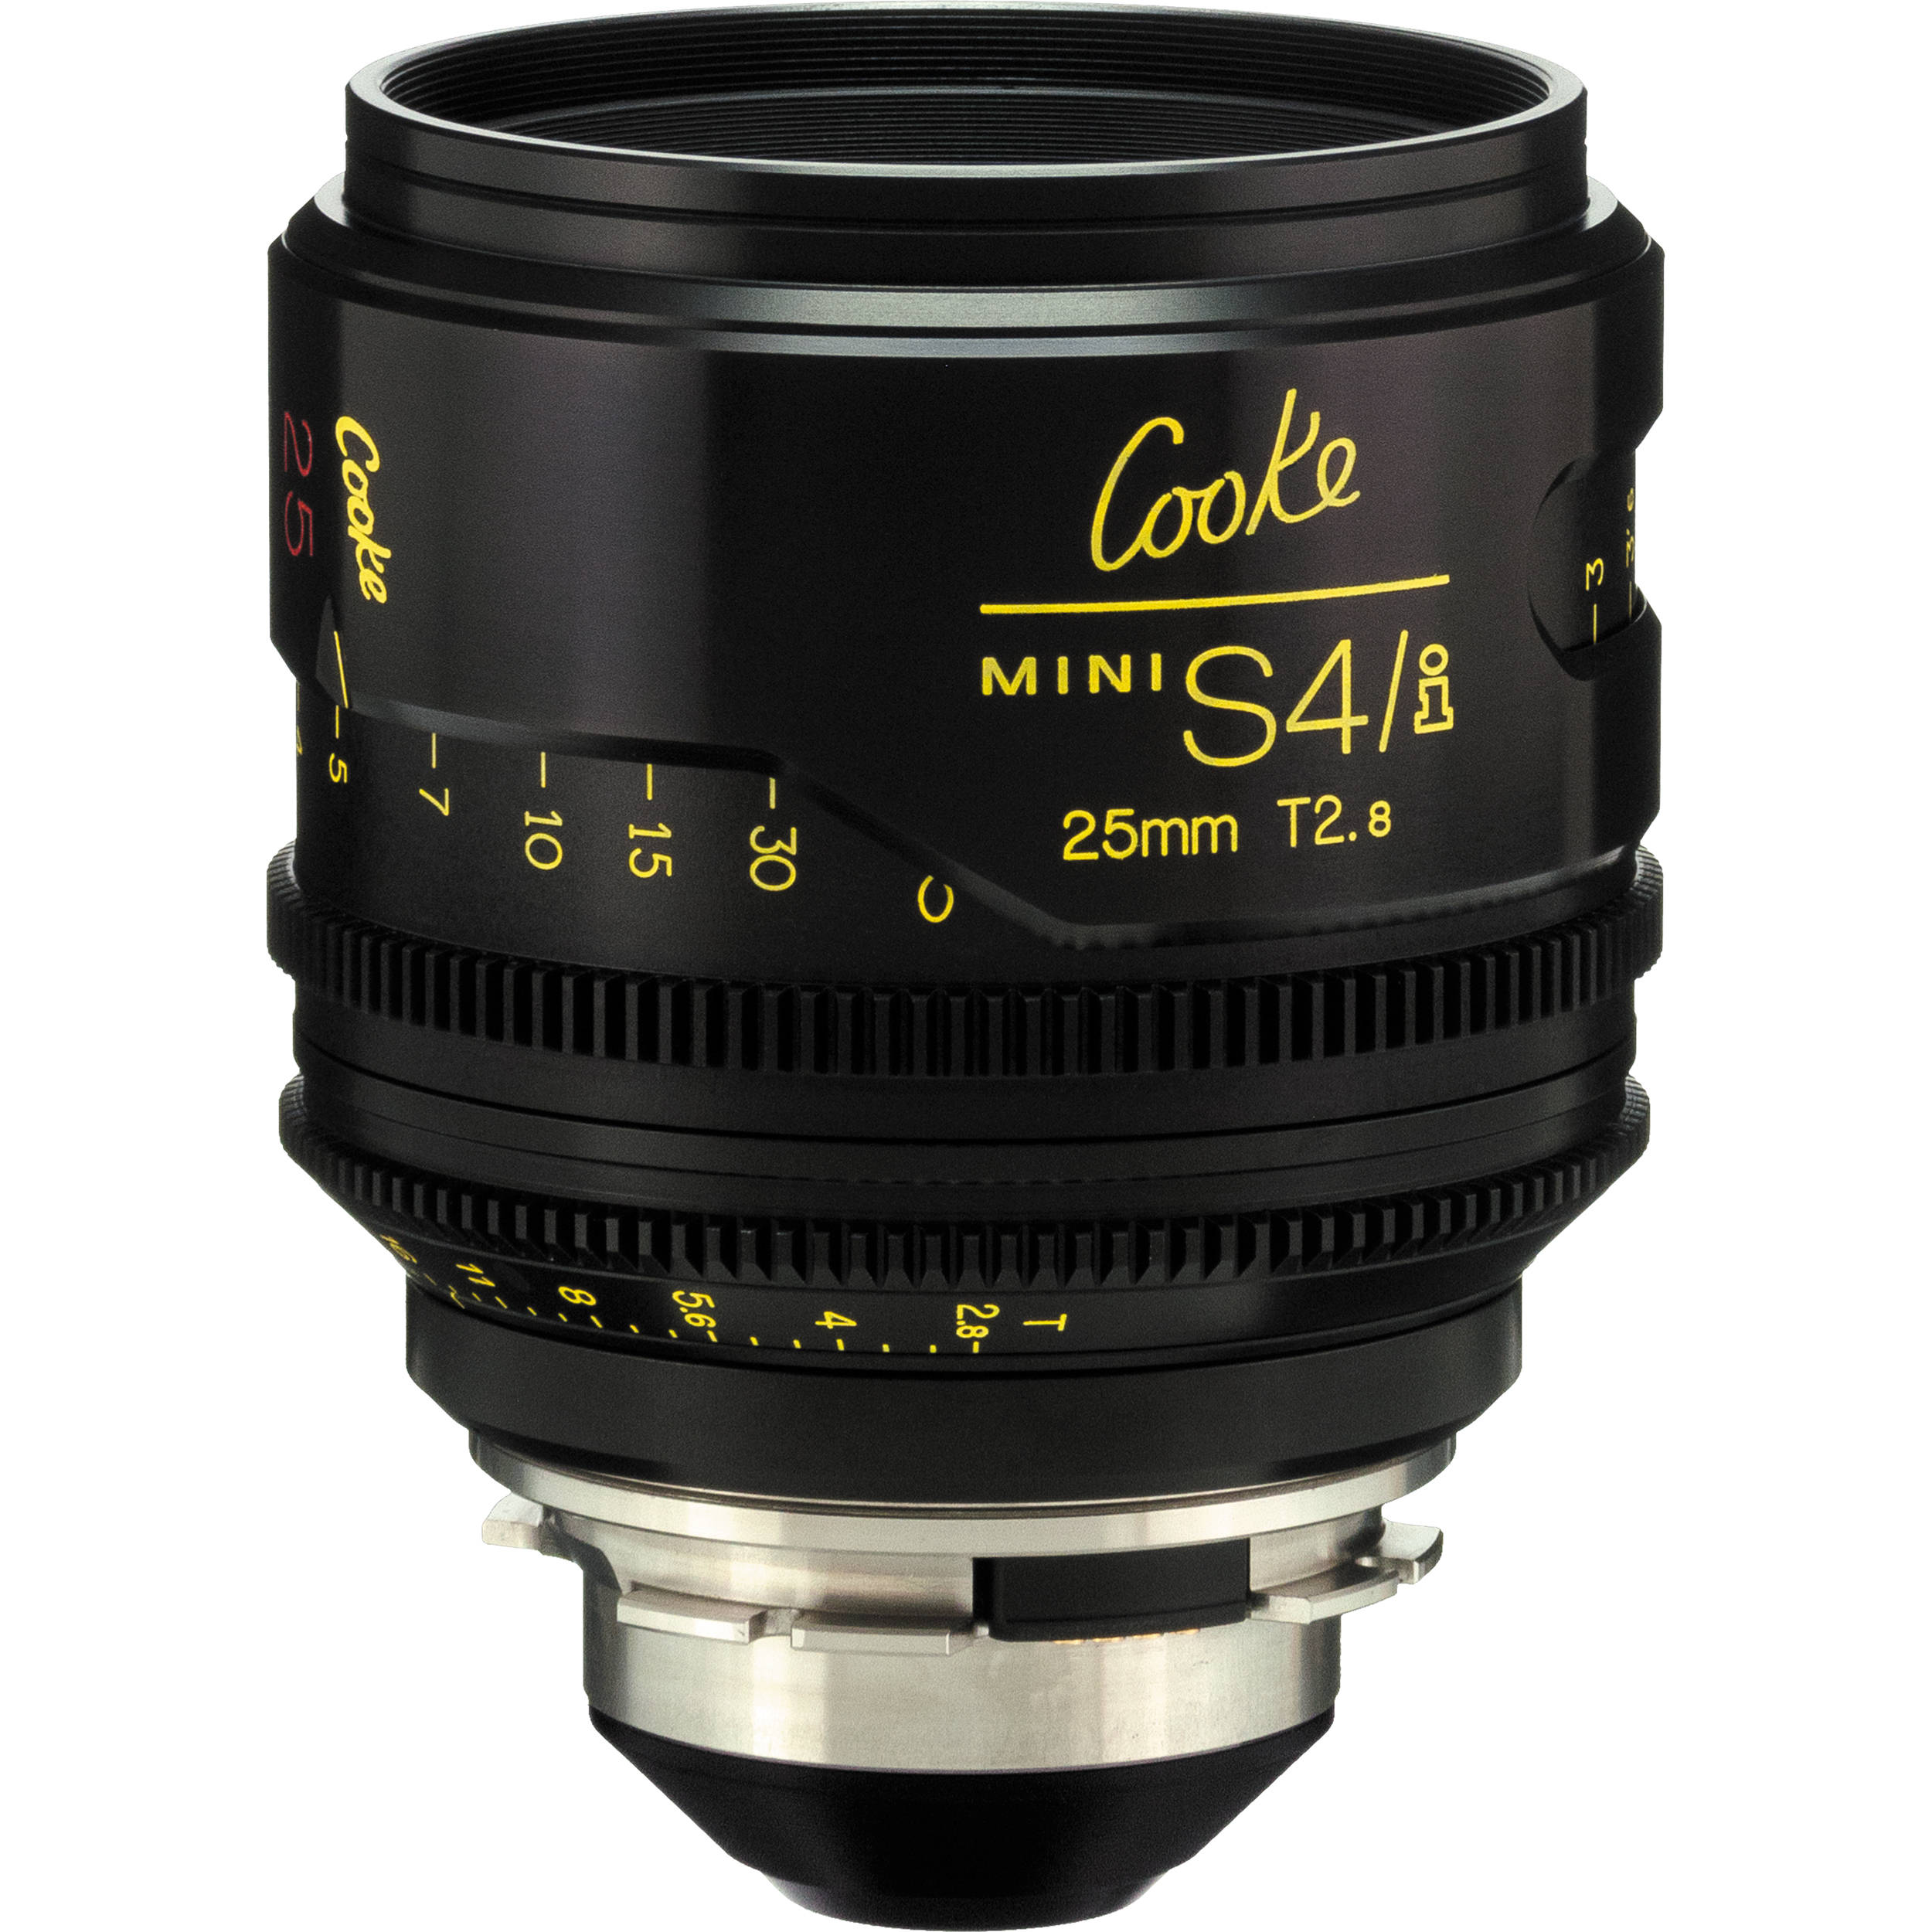 8ca49b66ddf8 Cooke 25mm T2.8 miniS4 i Cine Lens (Feet) CKEP 25 B H Photo